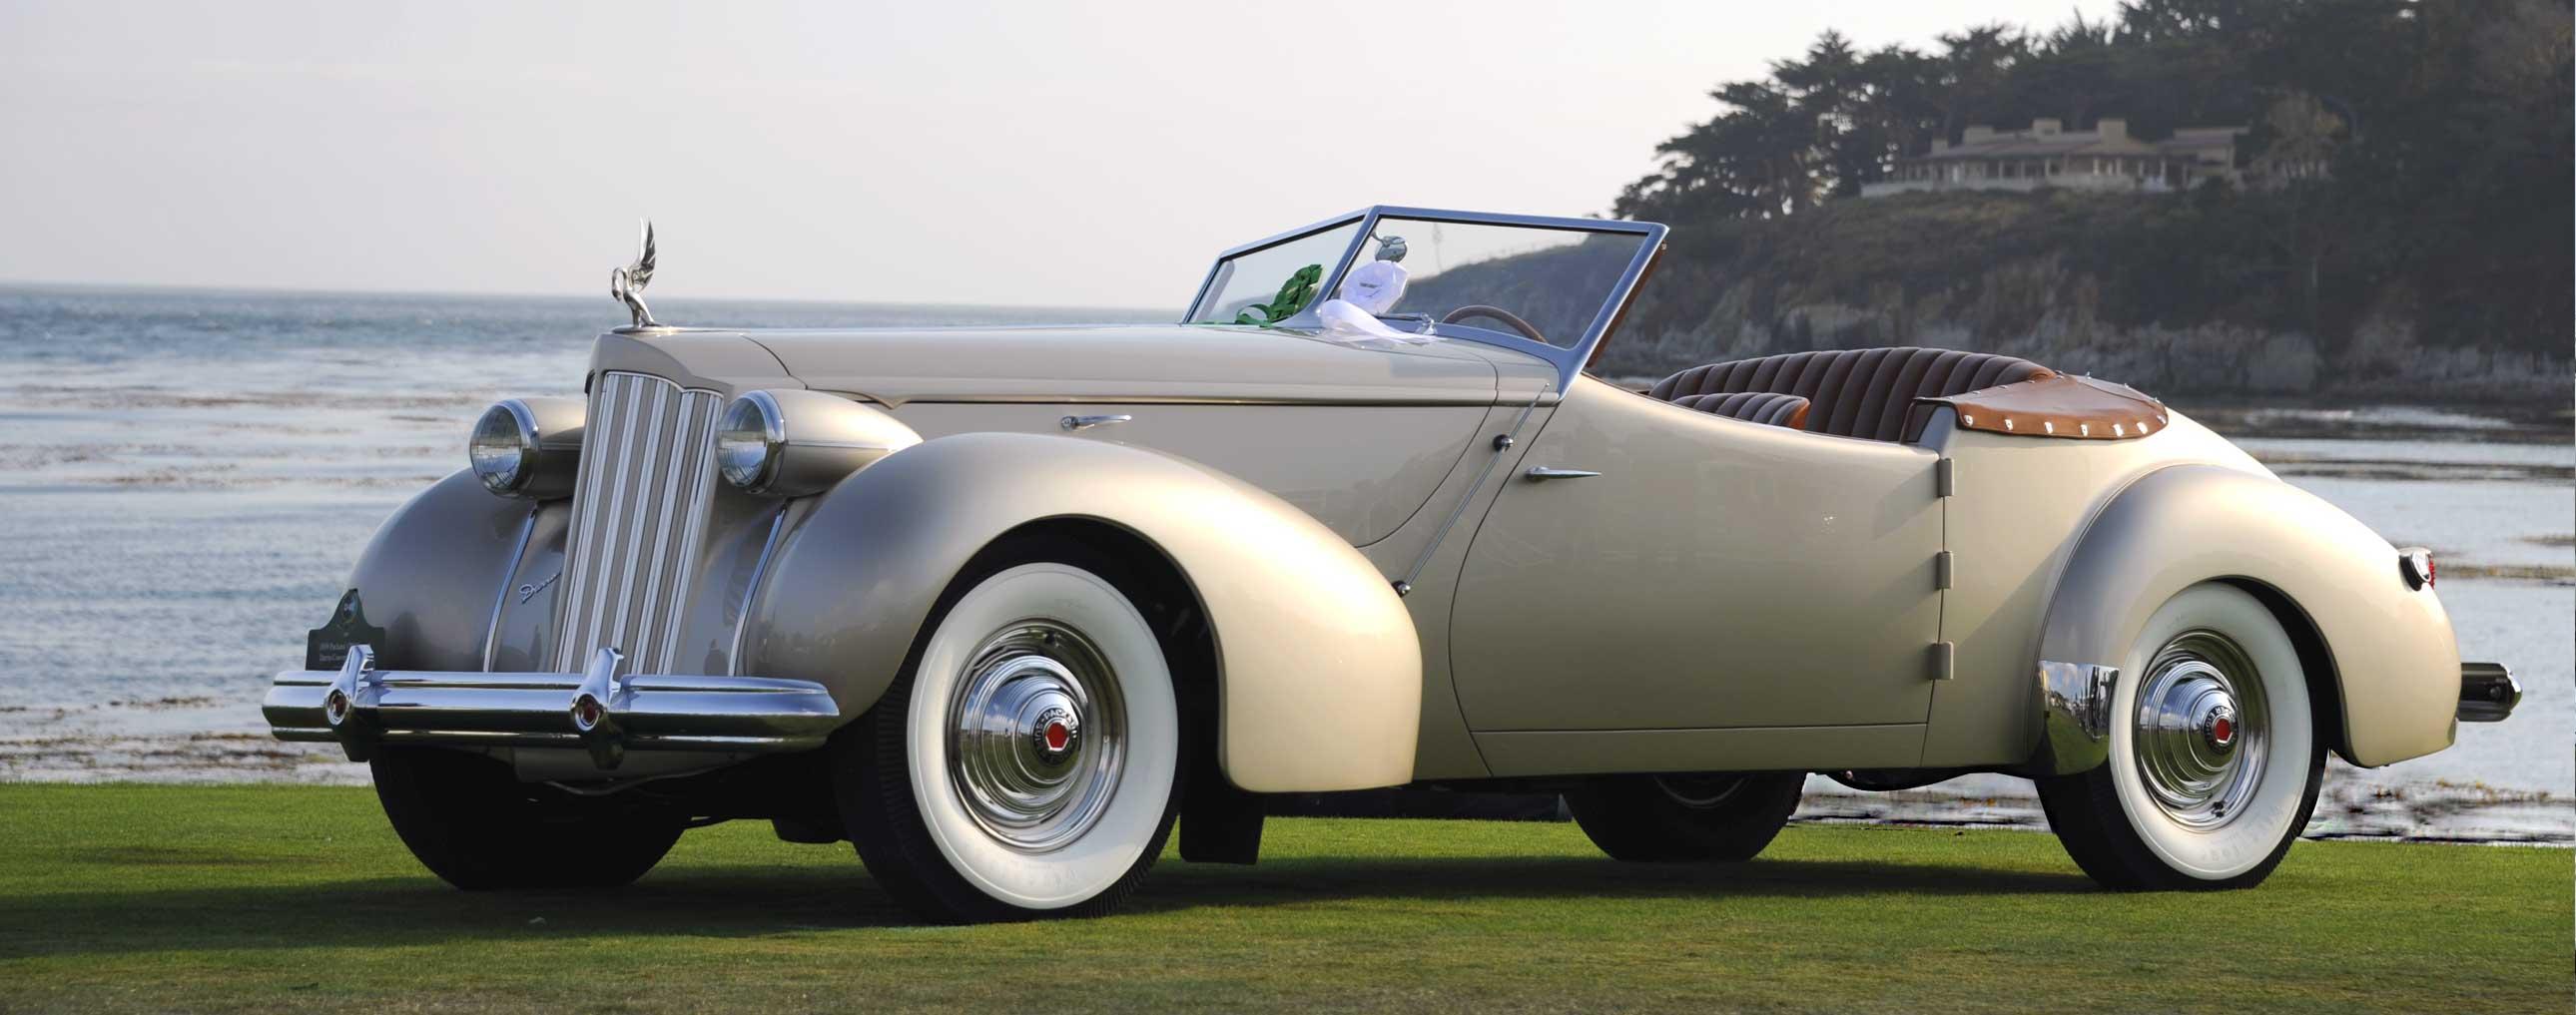 1939 Packard 1703 Super-8 Darrin Convertible Victoria | Pebble Beach Concours | The Milwaukee Masterpiece